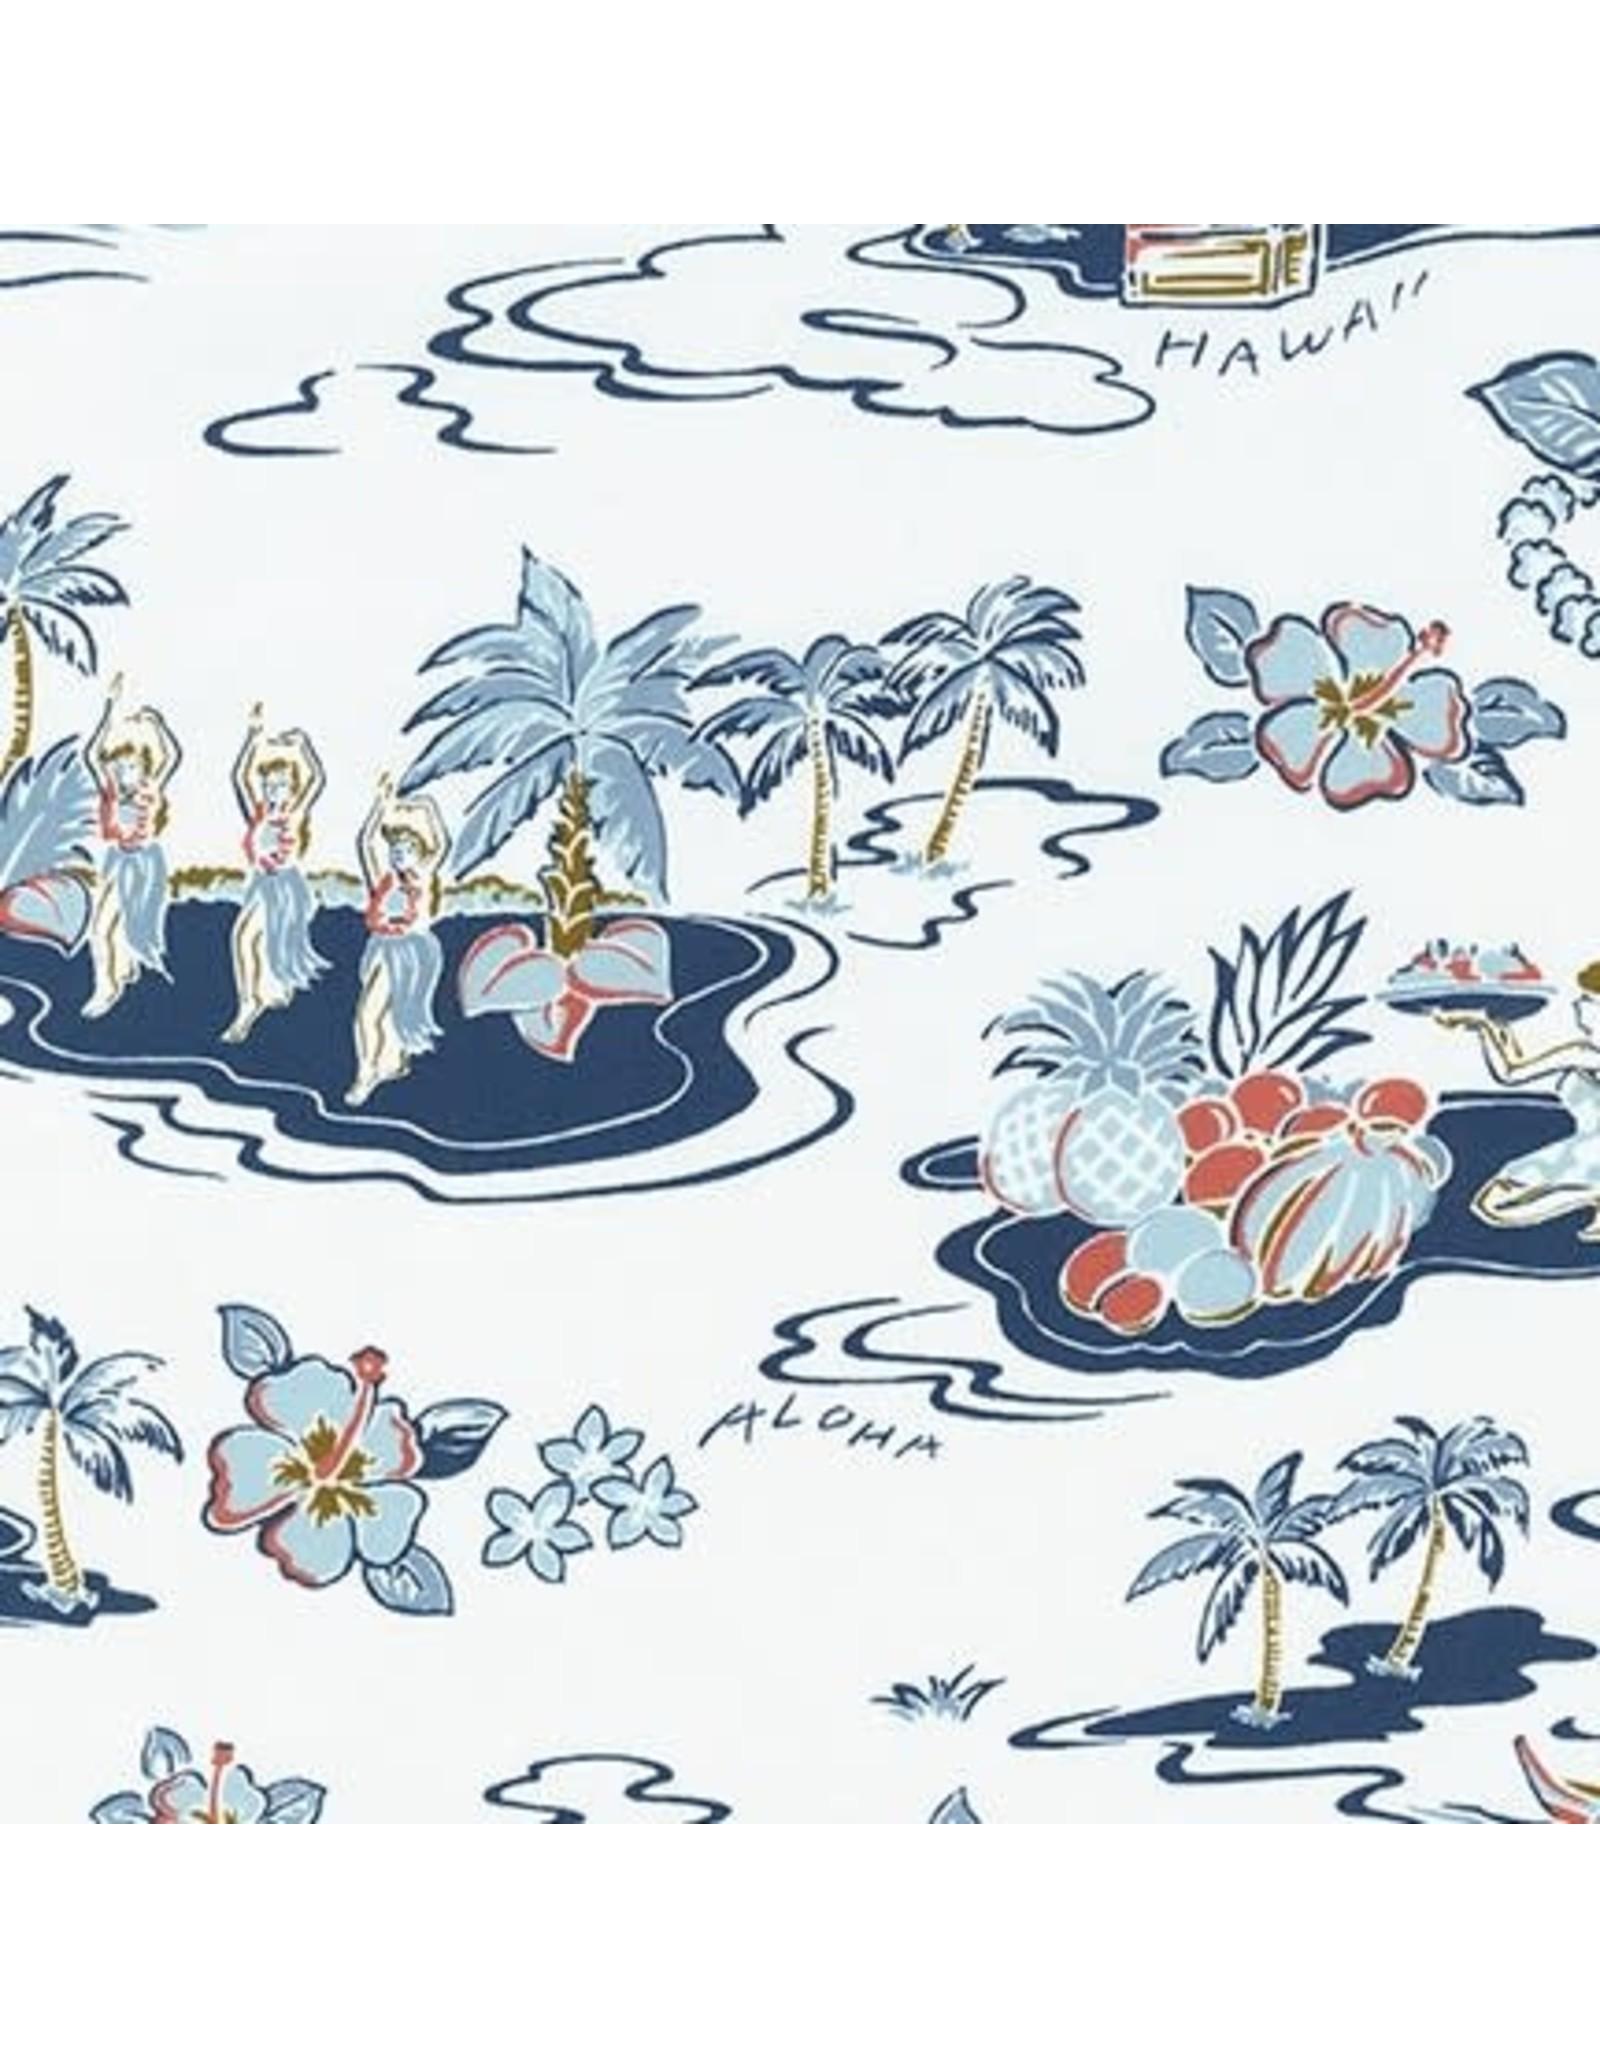 Sevenberry Rayon Lawn, Ecovero Aloha Prints, Hawaii in Bone, Fabric Half-Yards